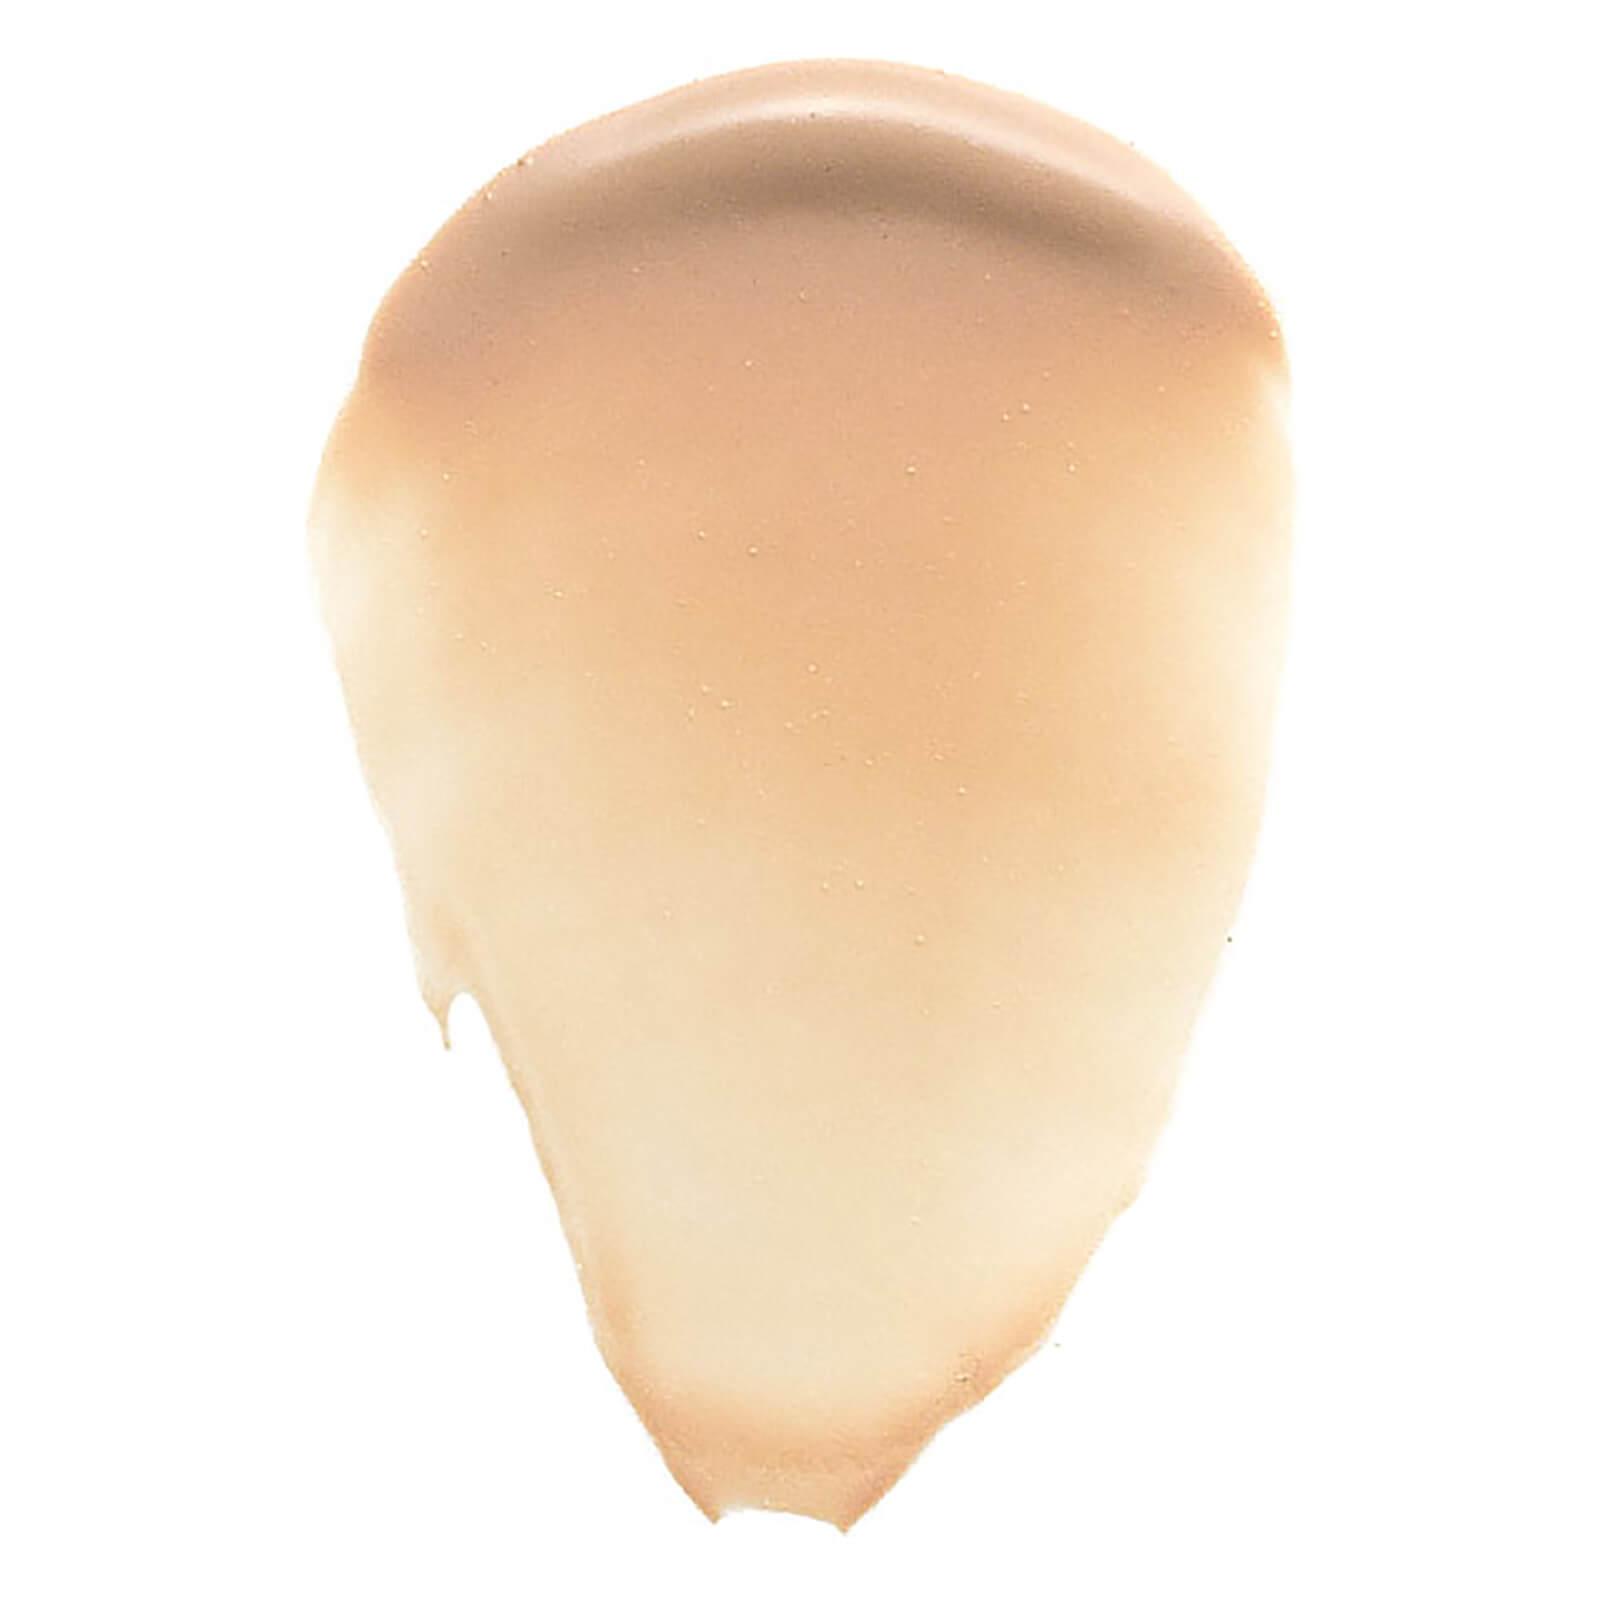 Bobbi Brown Soin Hydratant Teinté Nude Finish SPF 15 Bobbi Brown (différentes teintes disponibles) - Extra Light Tint